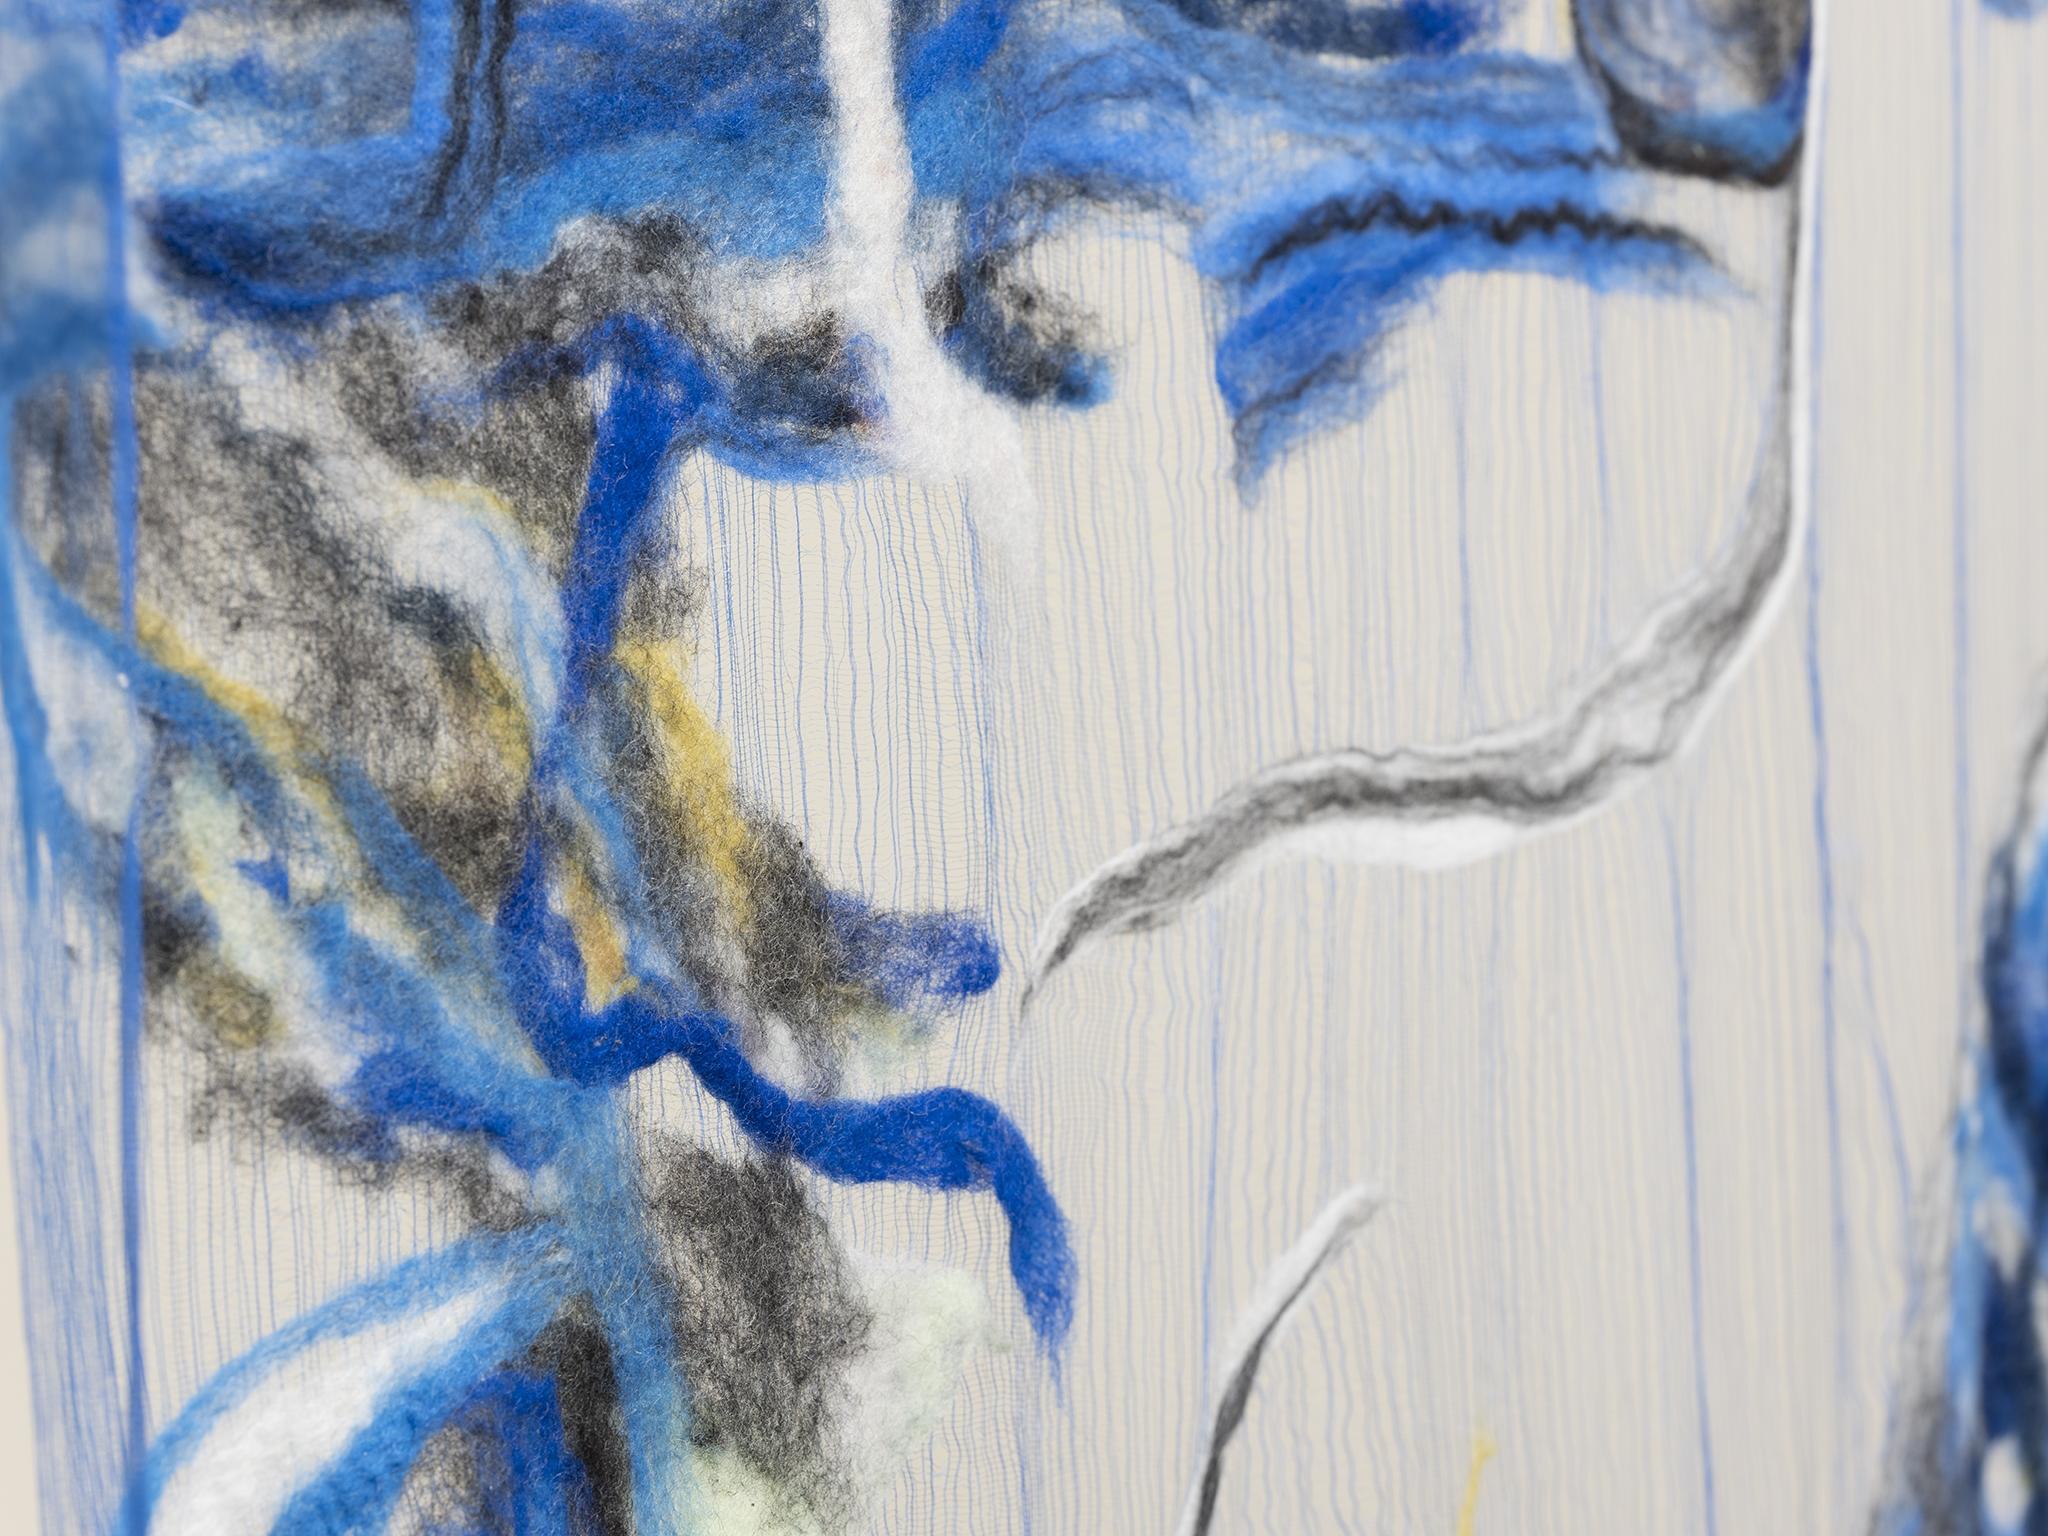 Rebecca Brewer, Scrim: Dagger (detail), 2019, silk gauze, wool, ball chain, alligator clips, 132 x 45 in. (335 x 113 cm) by